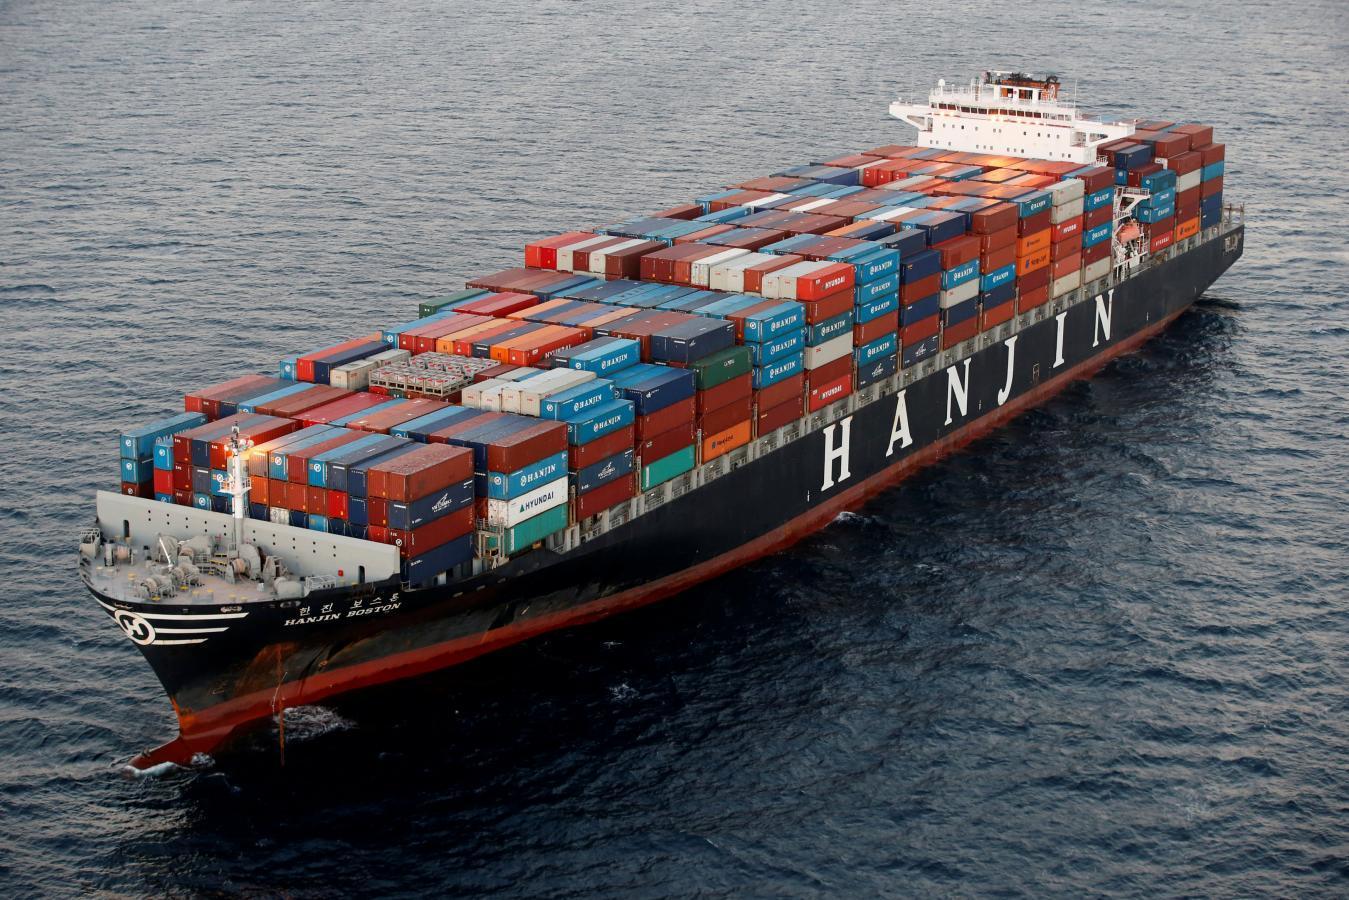 Ship shake: Hanjin woes may help float tech, data start-ups